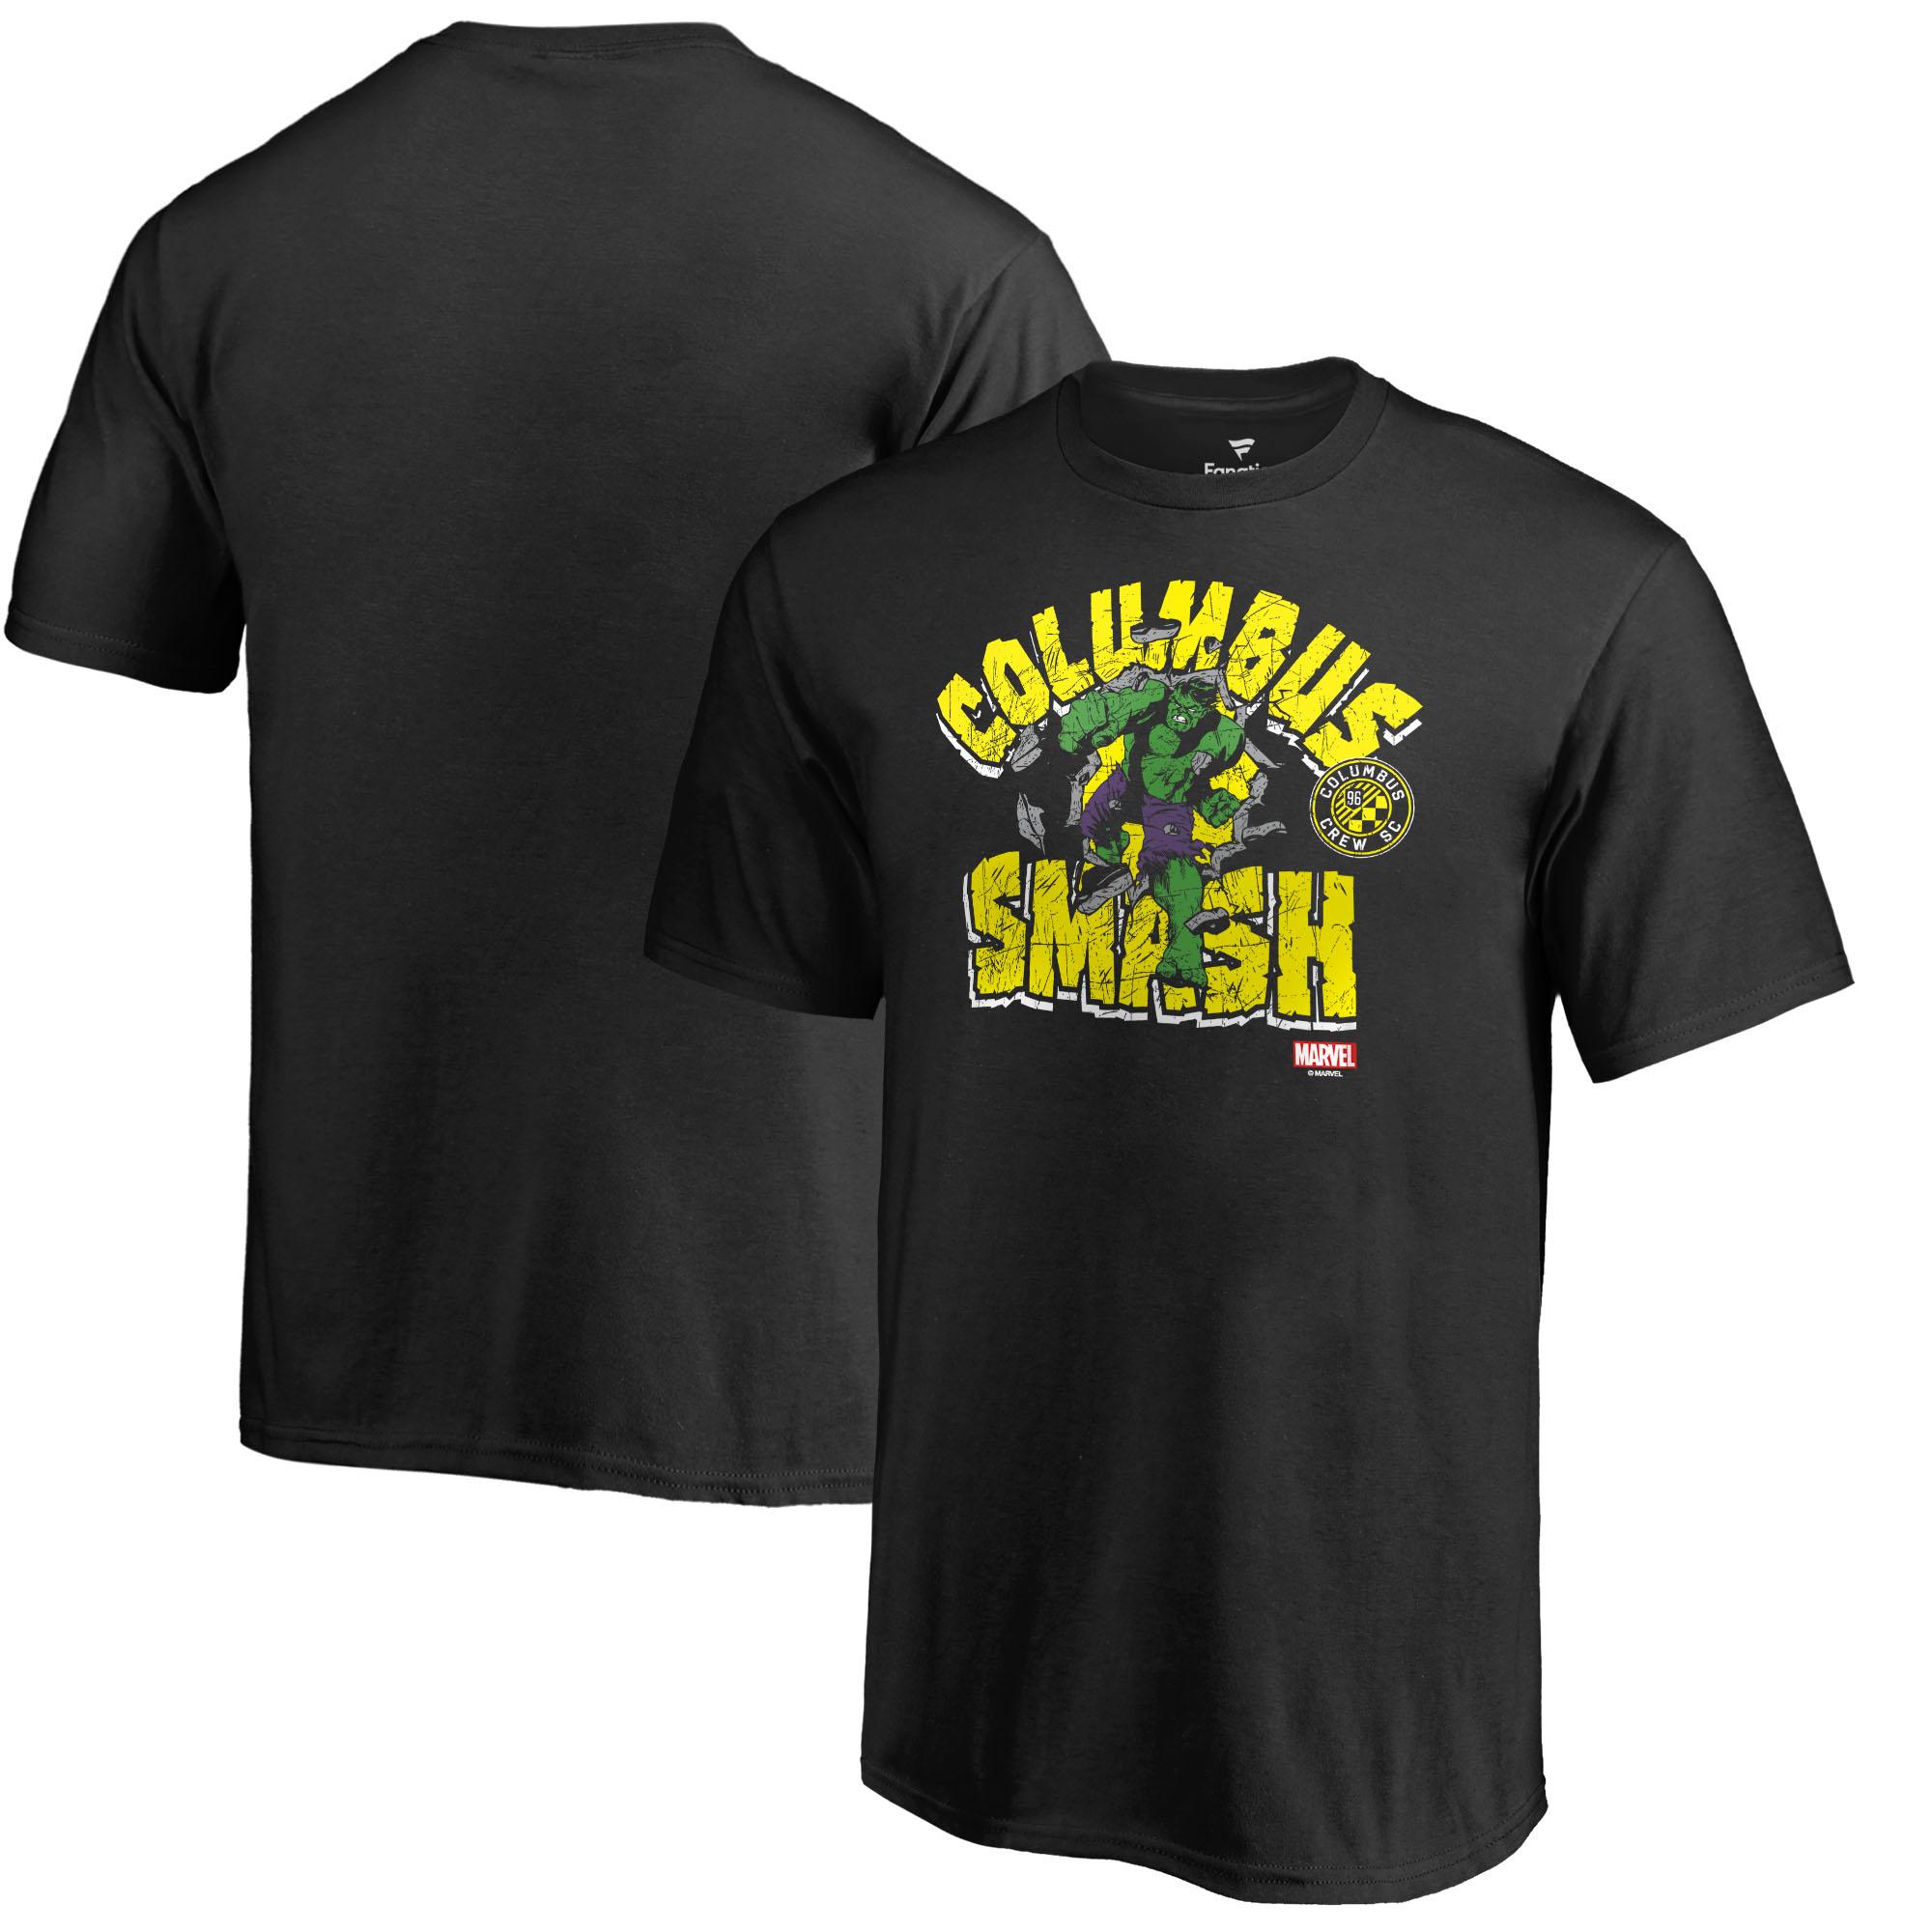 Columbus Crew SC Fanatics Branded Youth MLS Marvel Hulk Smash T-Shirt - Black